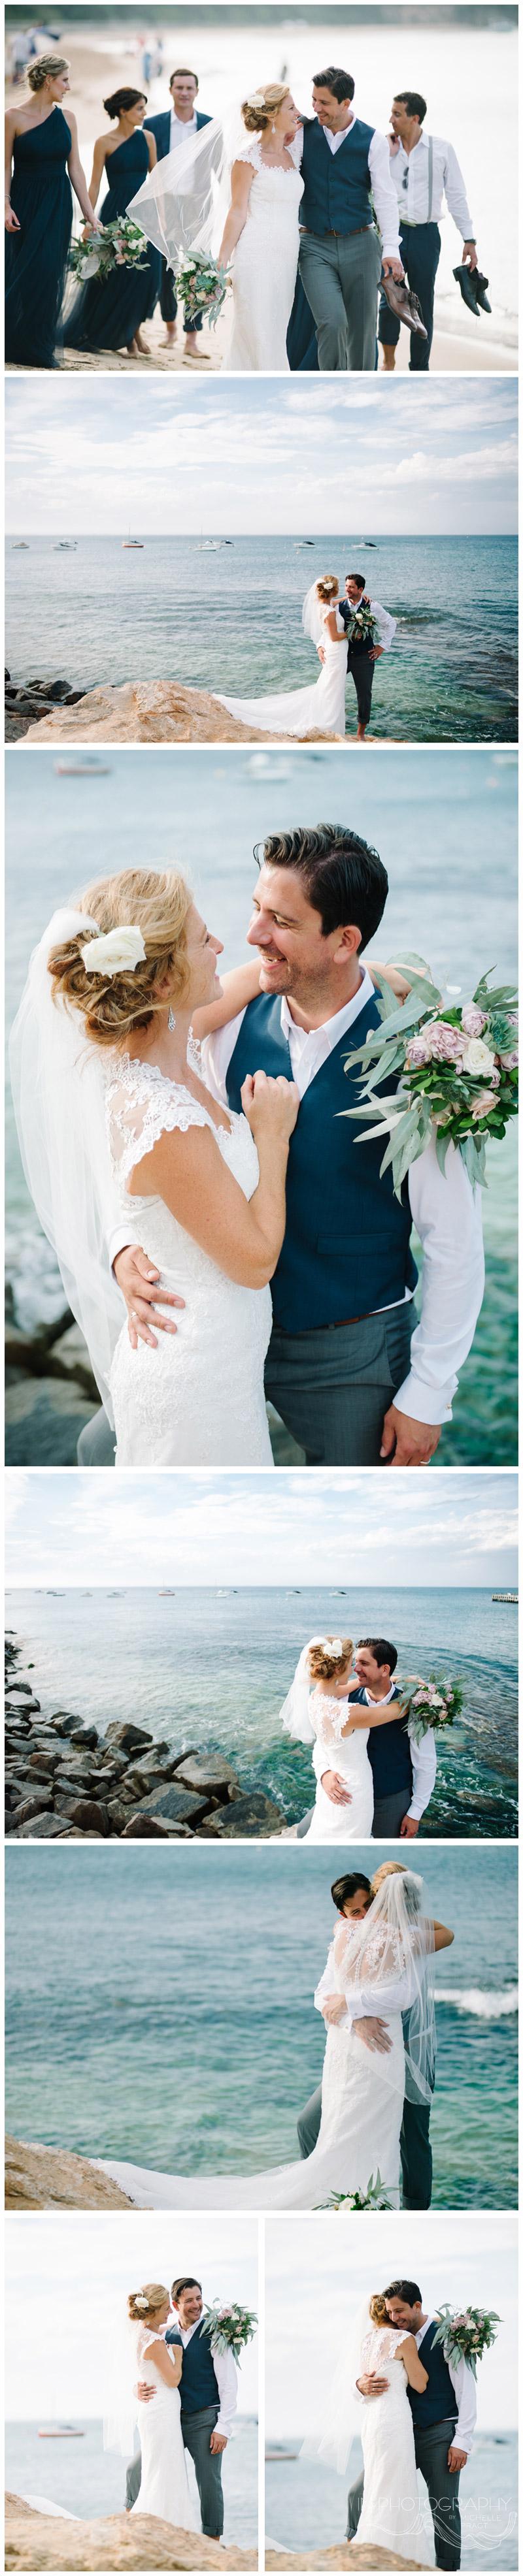 bride and groom beach photos at Portsea